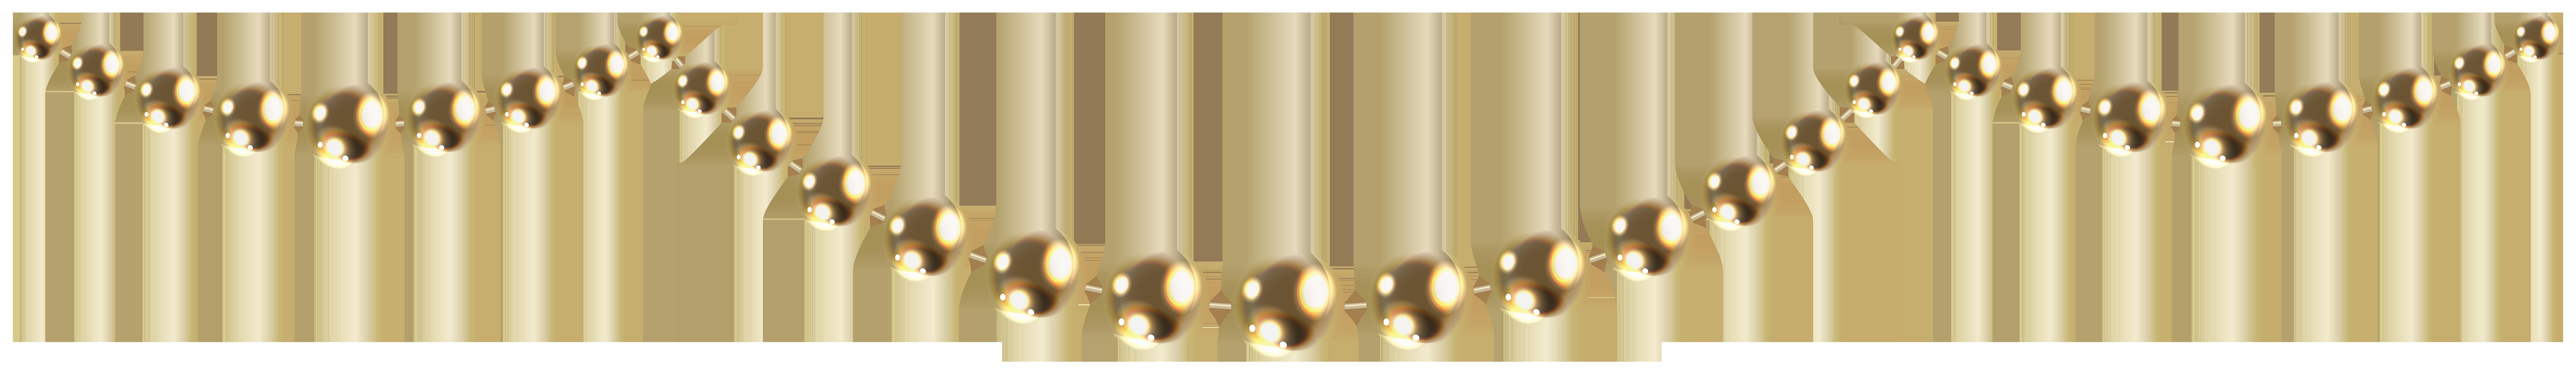 Jss Memories Circle Of Pearls Copy Png Pearls Frame Circle